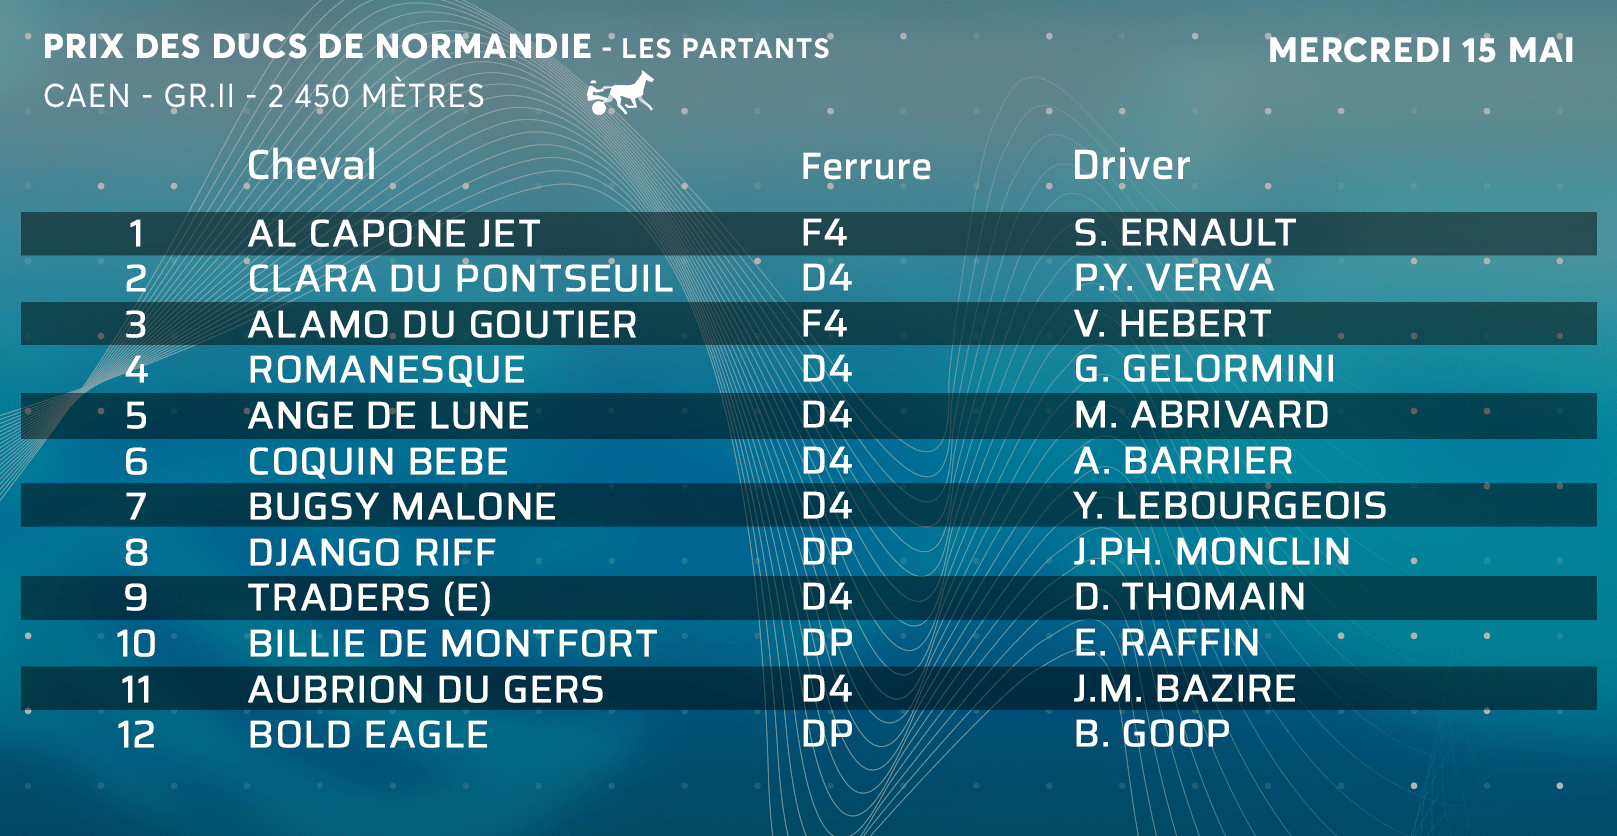 prix-des-ducs-de-normandie-jpg.png